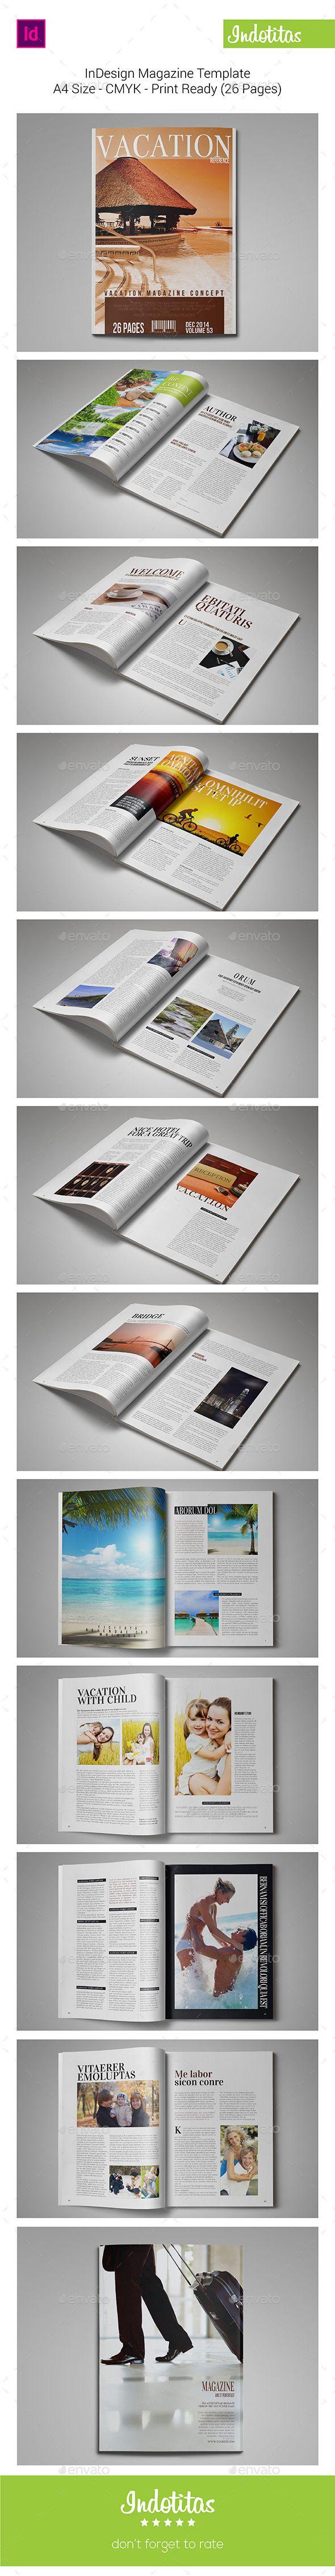 Indesign Magazine Template Pinterest Indesign Magazine Templates